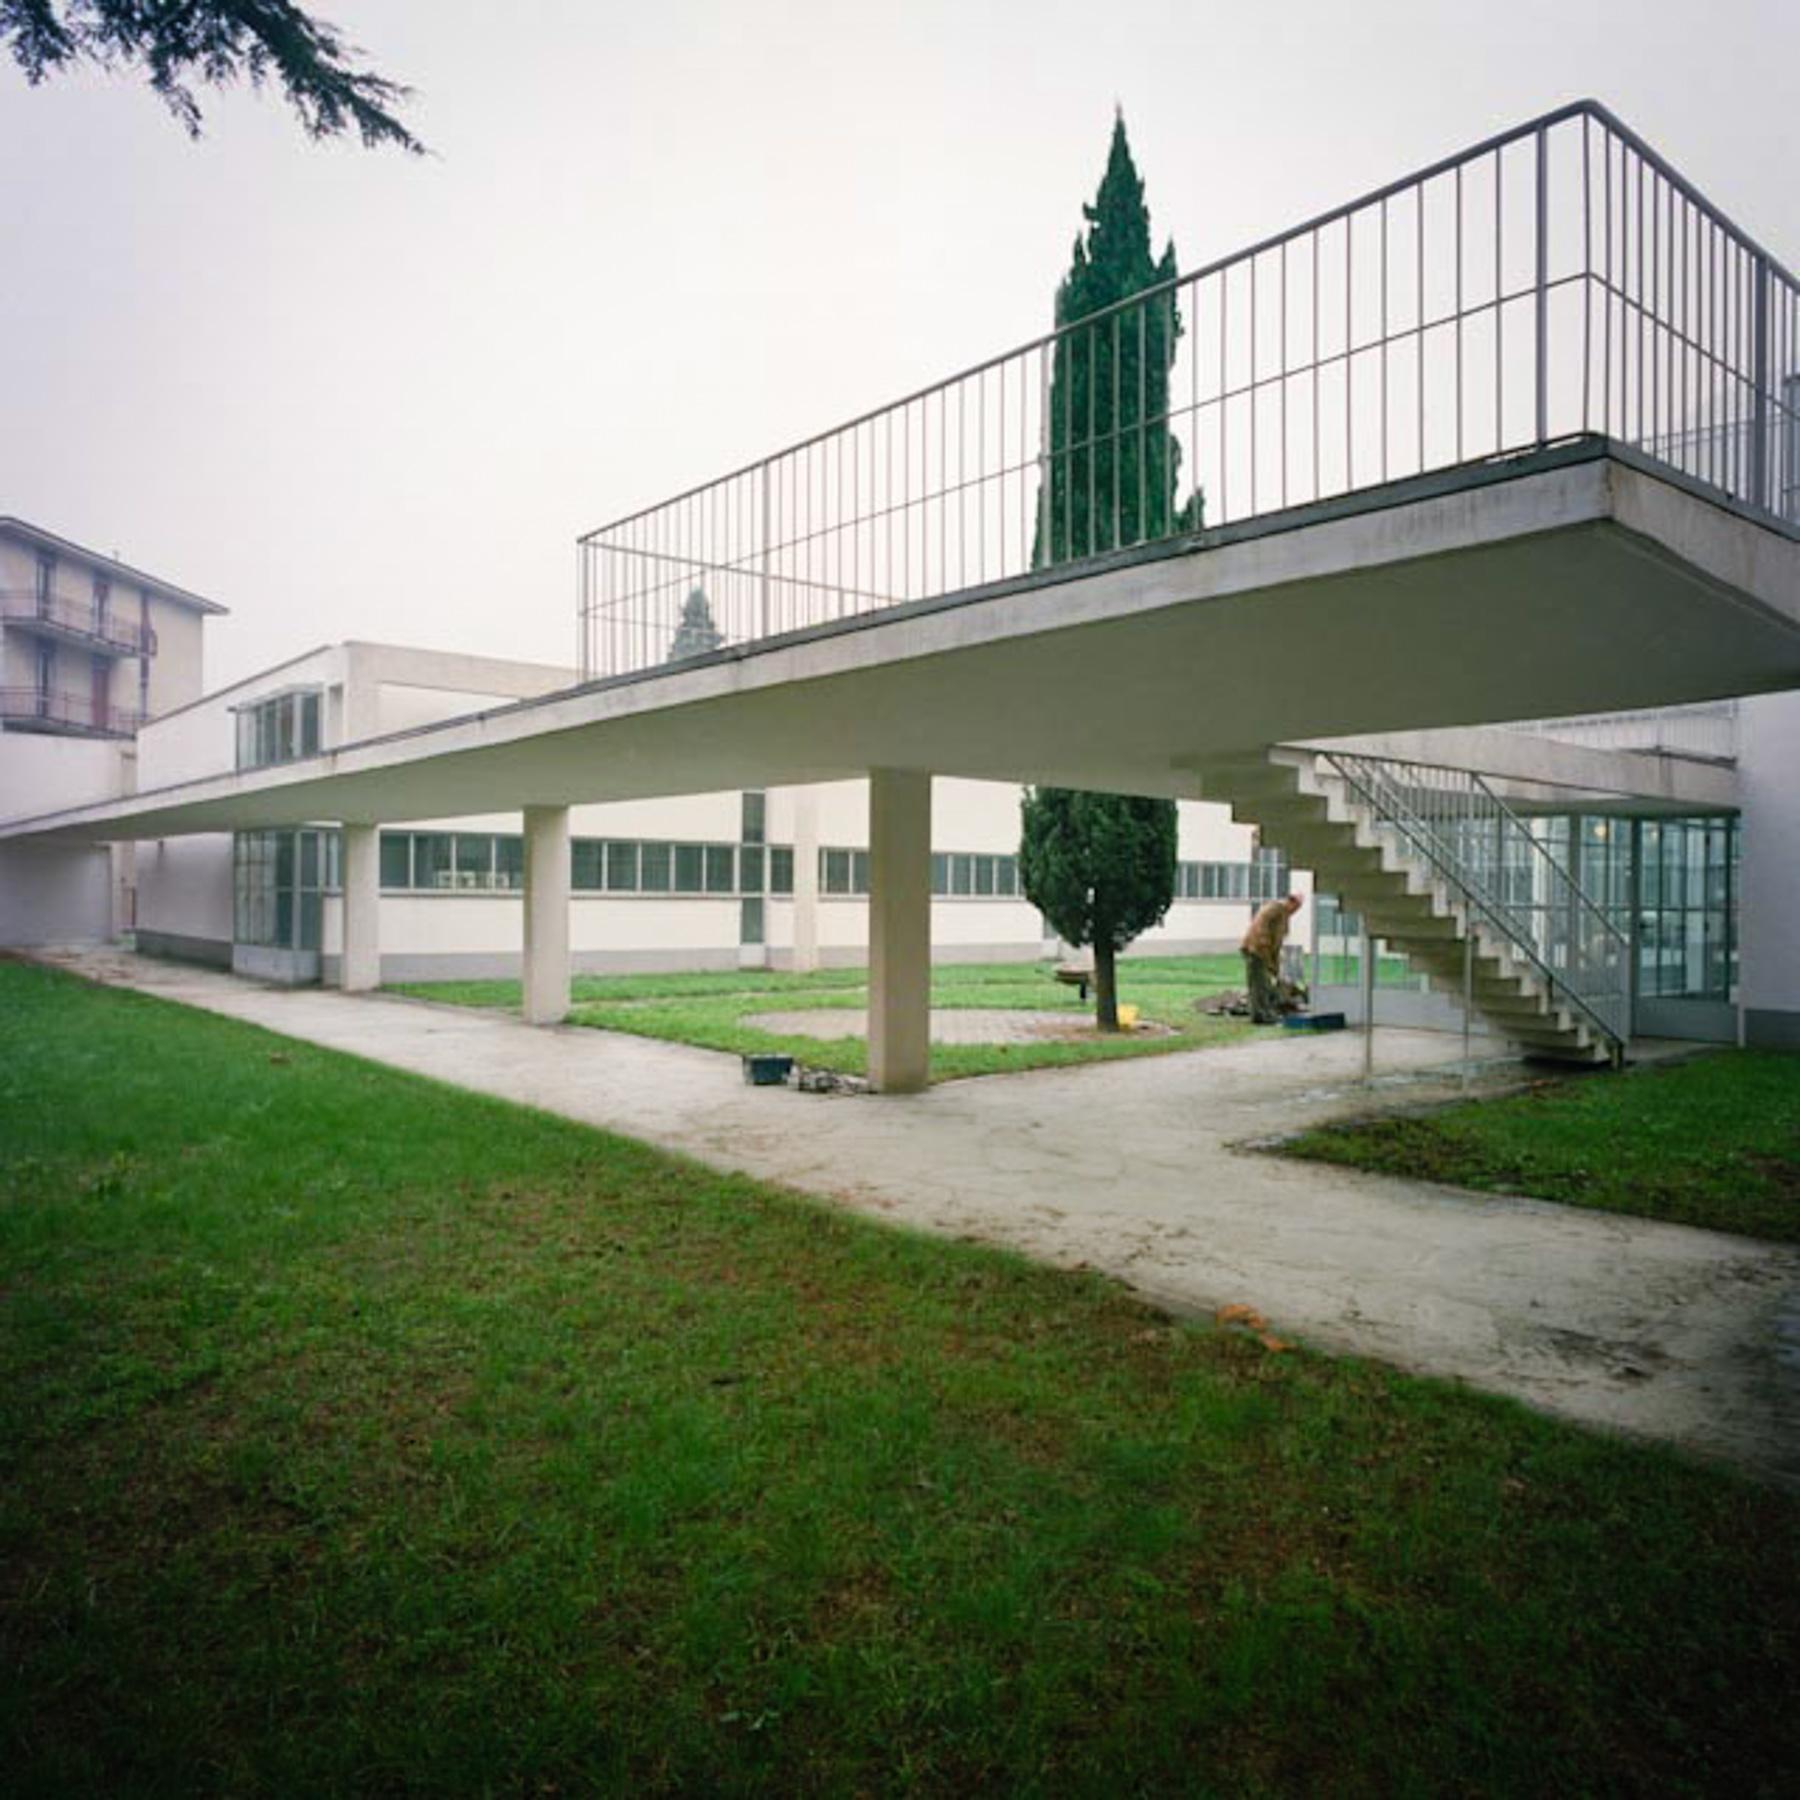 terragni-10.jpg